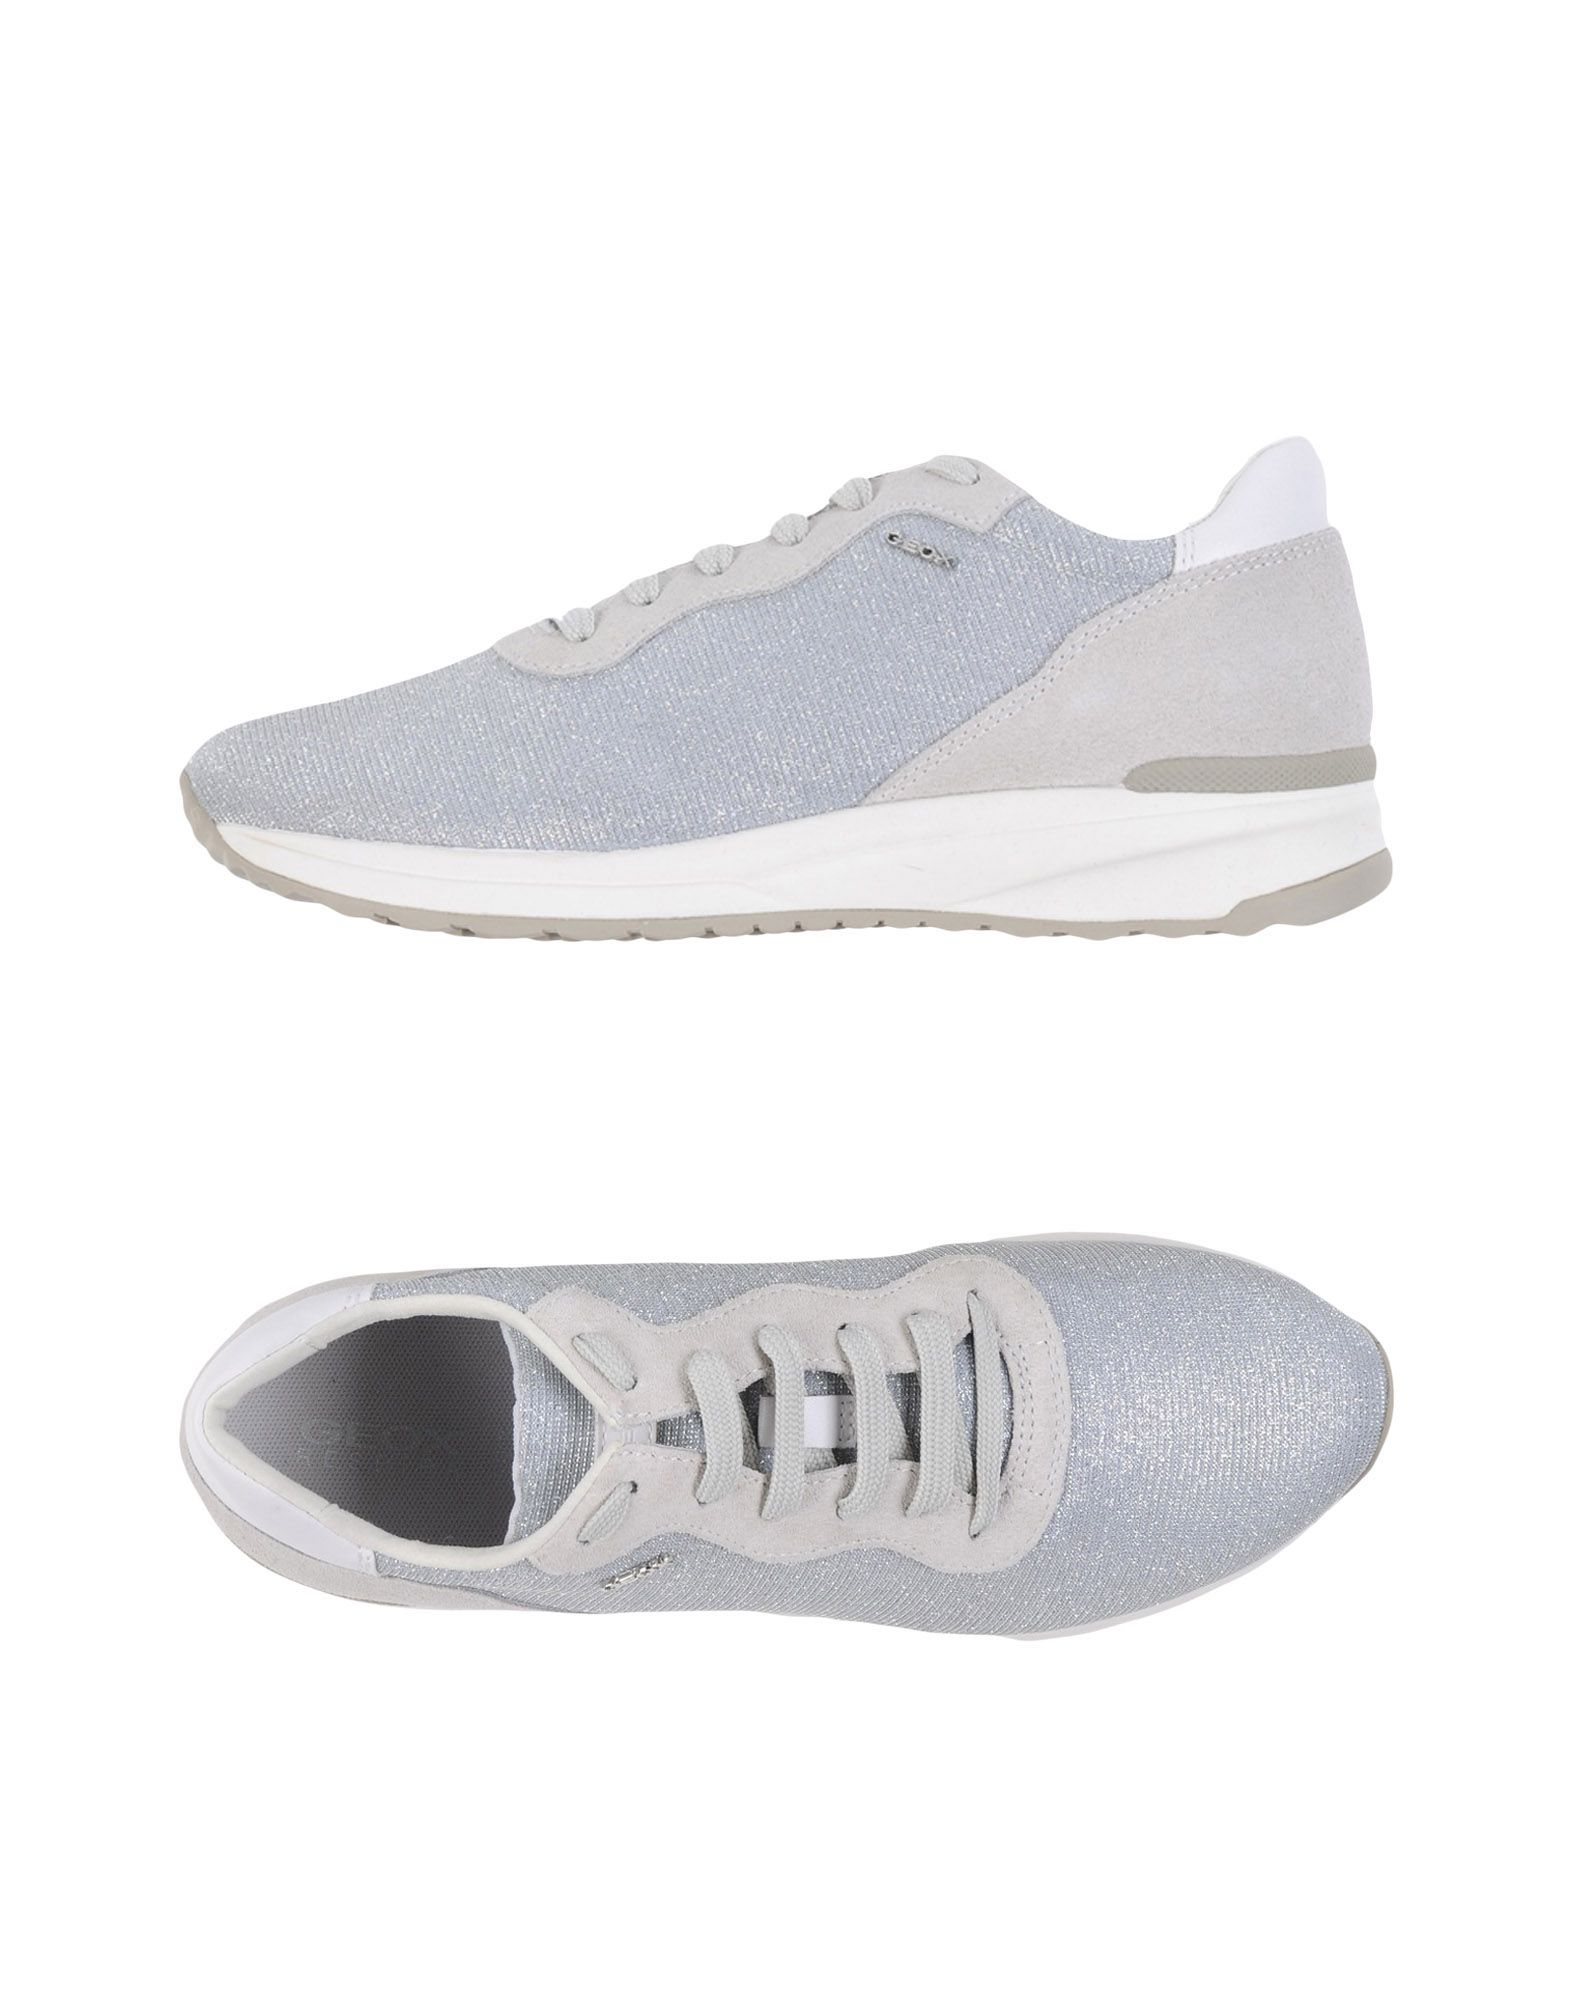 Geox Sneakers Damen  11192020LS Gute Qualität beliebte Schuhe